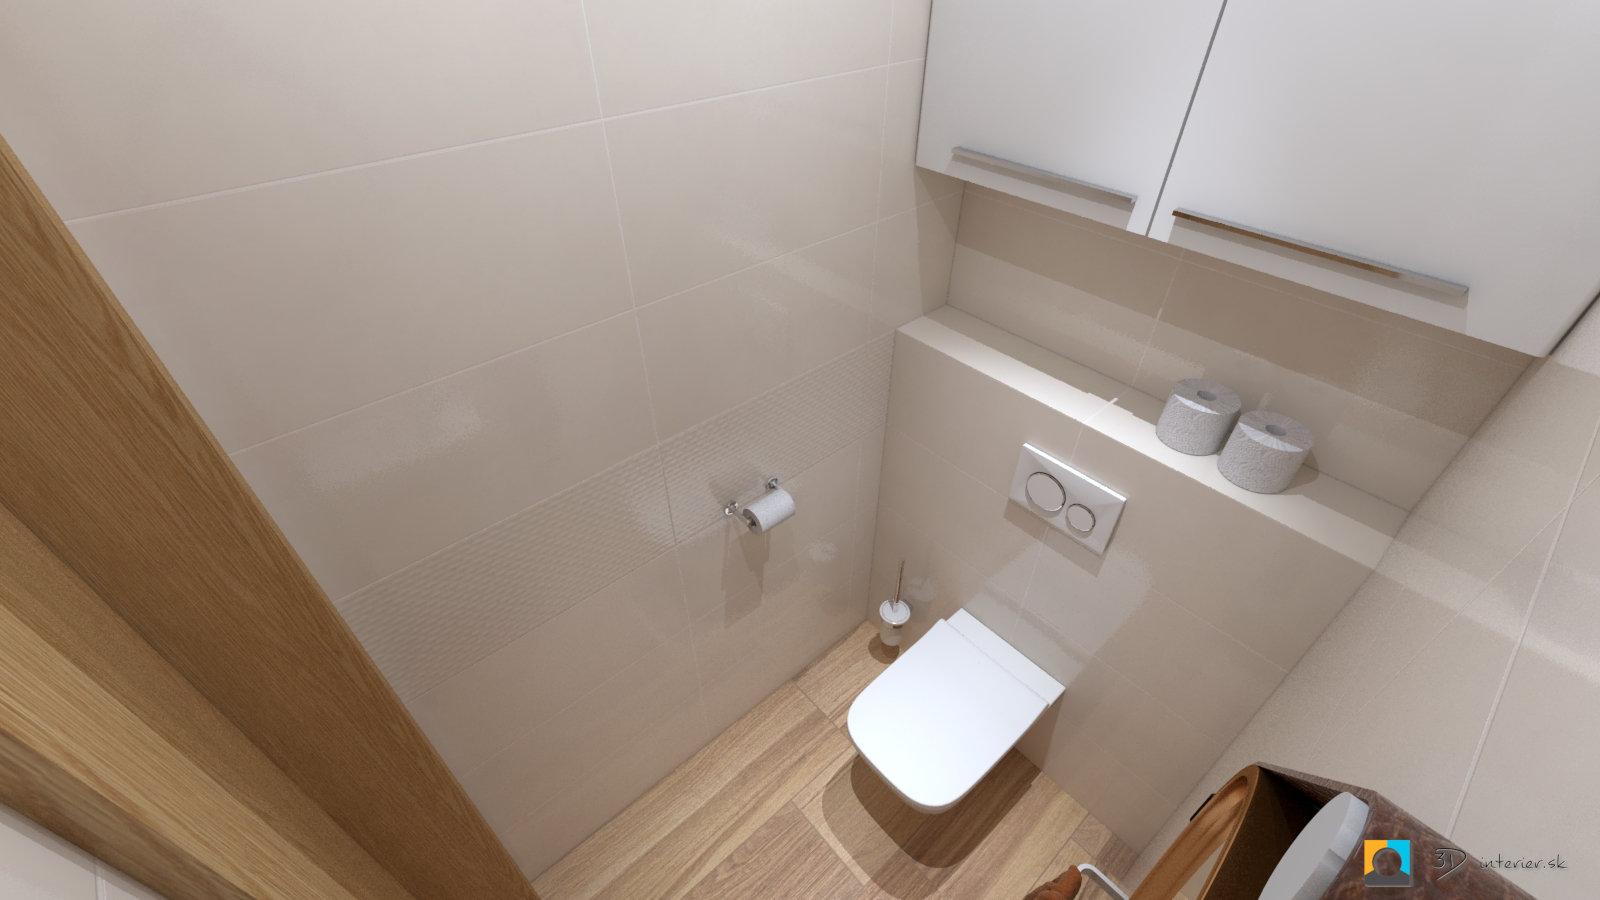 vizualizacia toalety zavesne wc